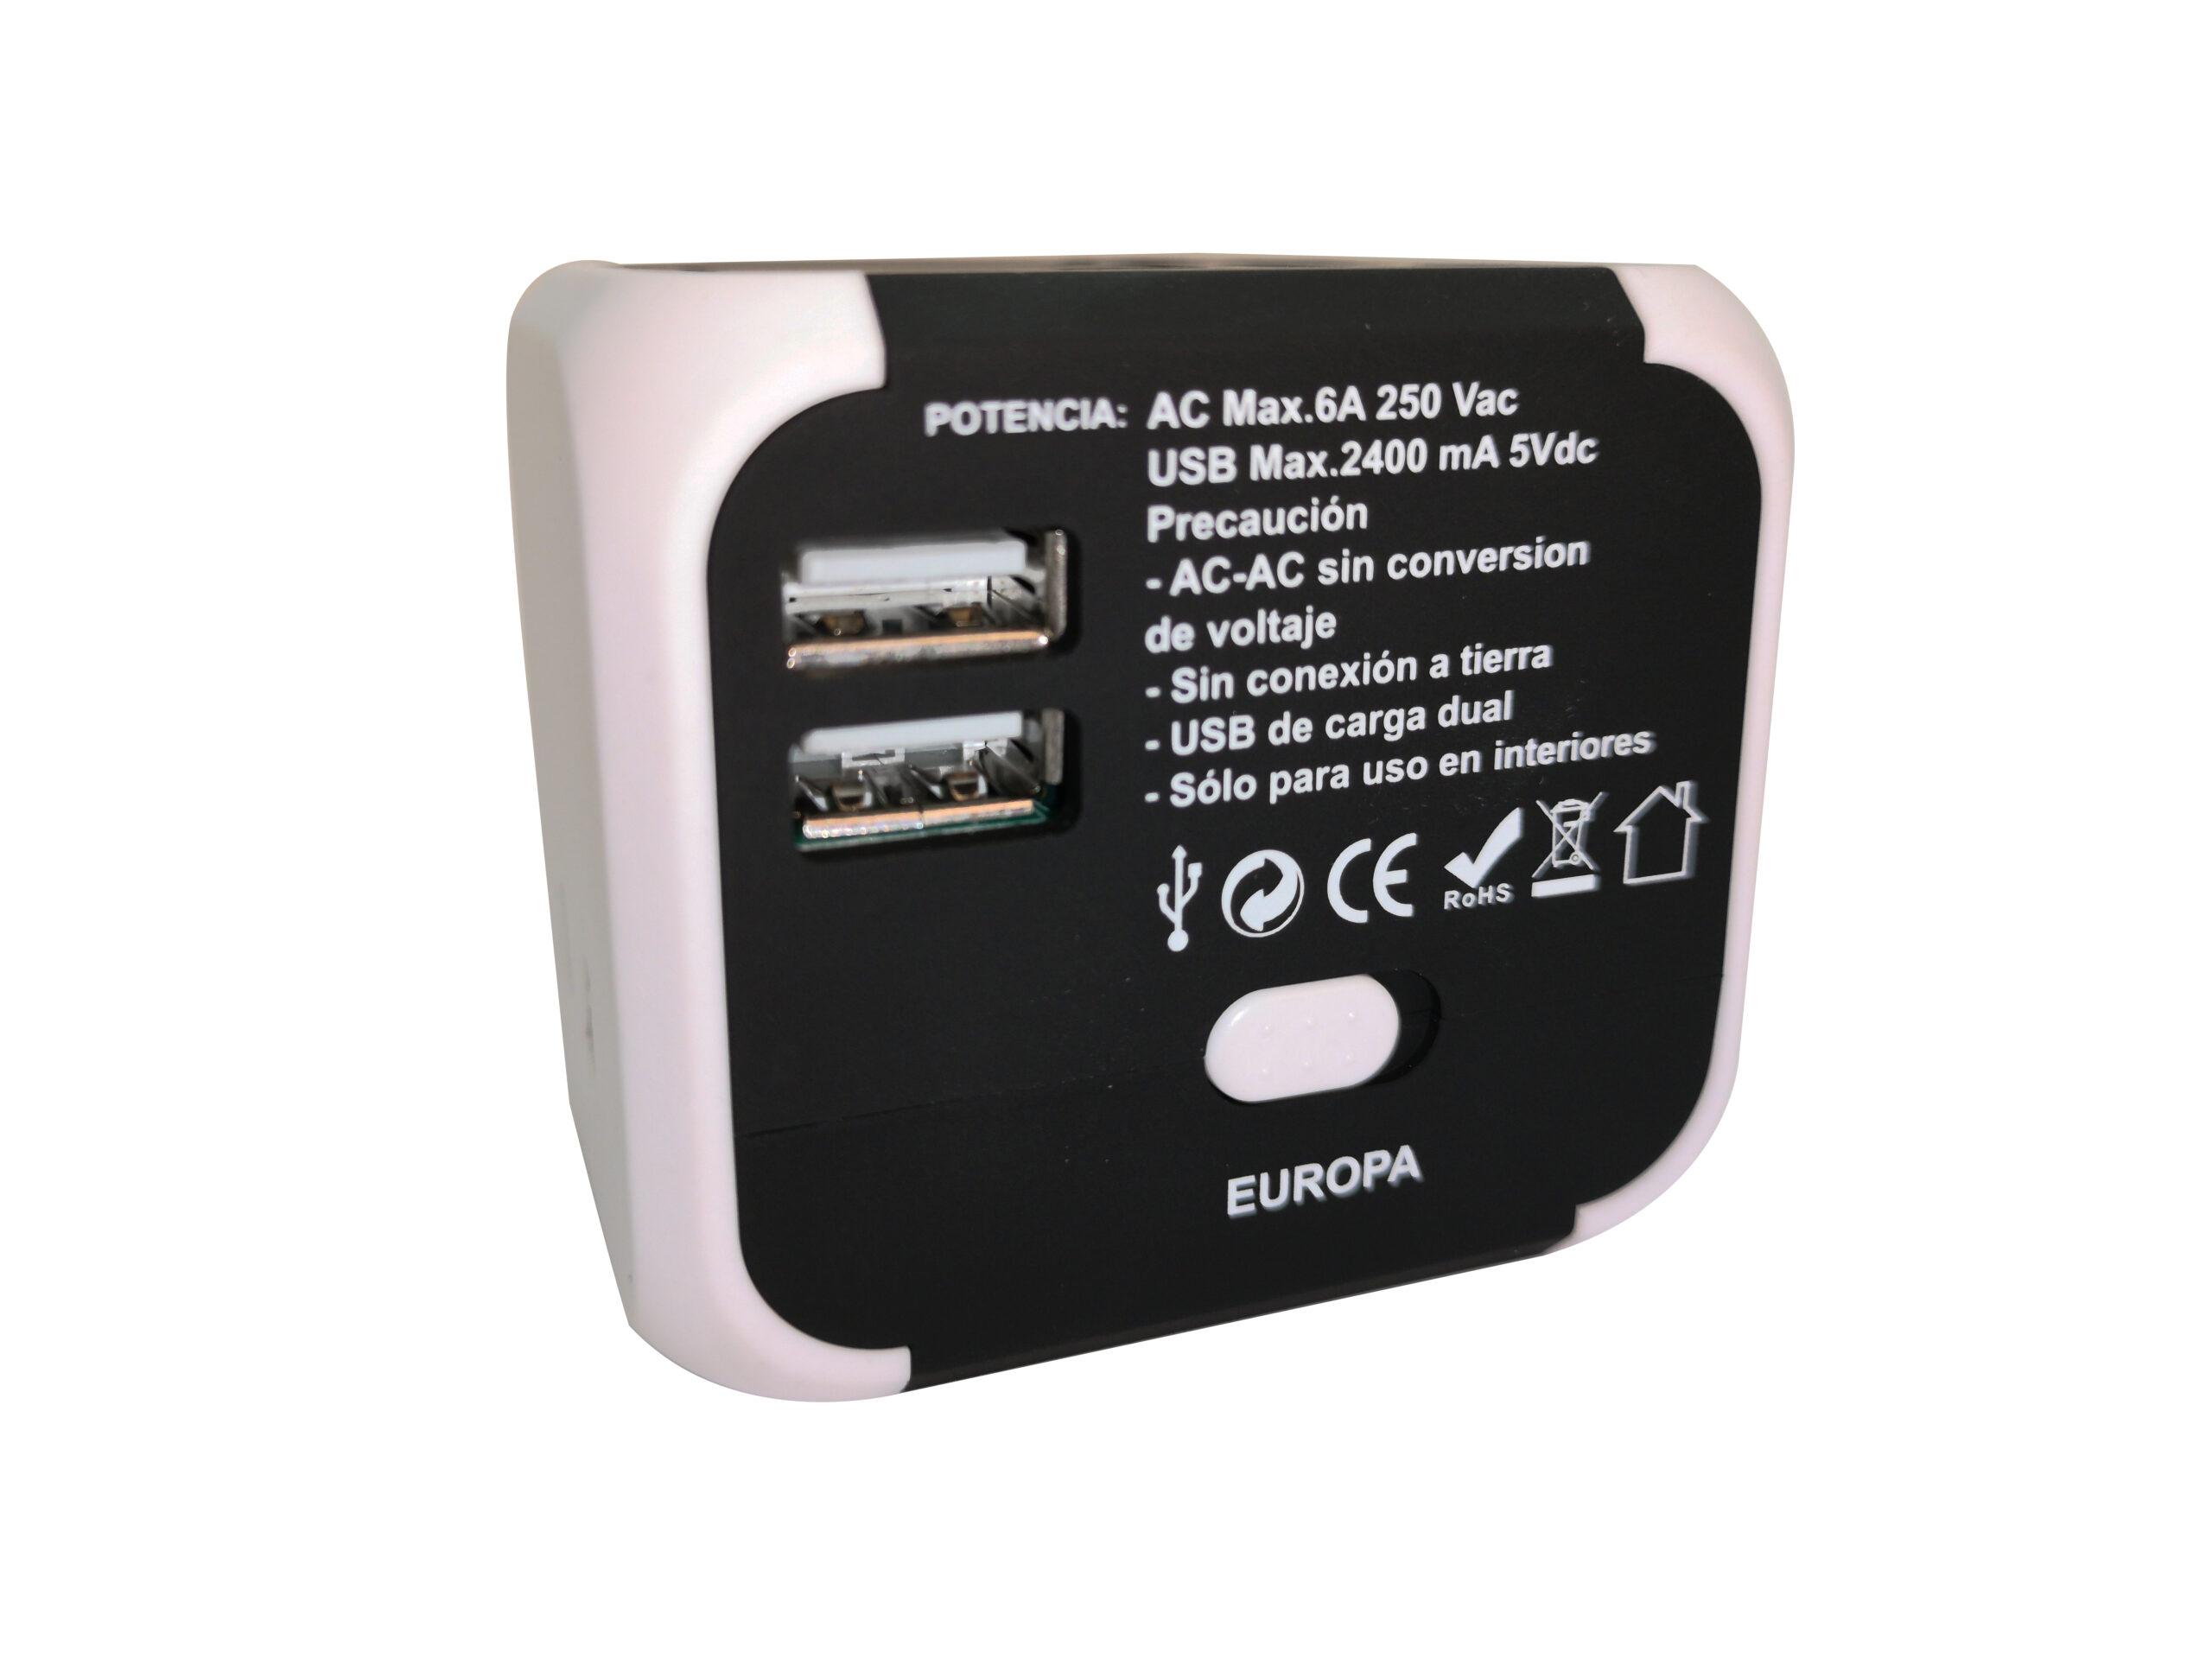 Enchufe adaptador universal usb BN3803